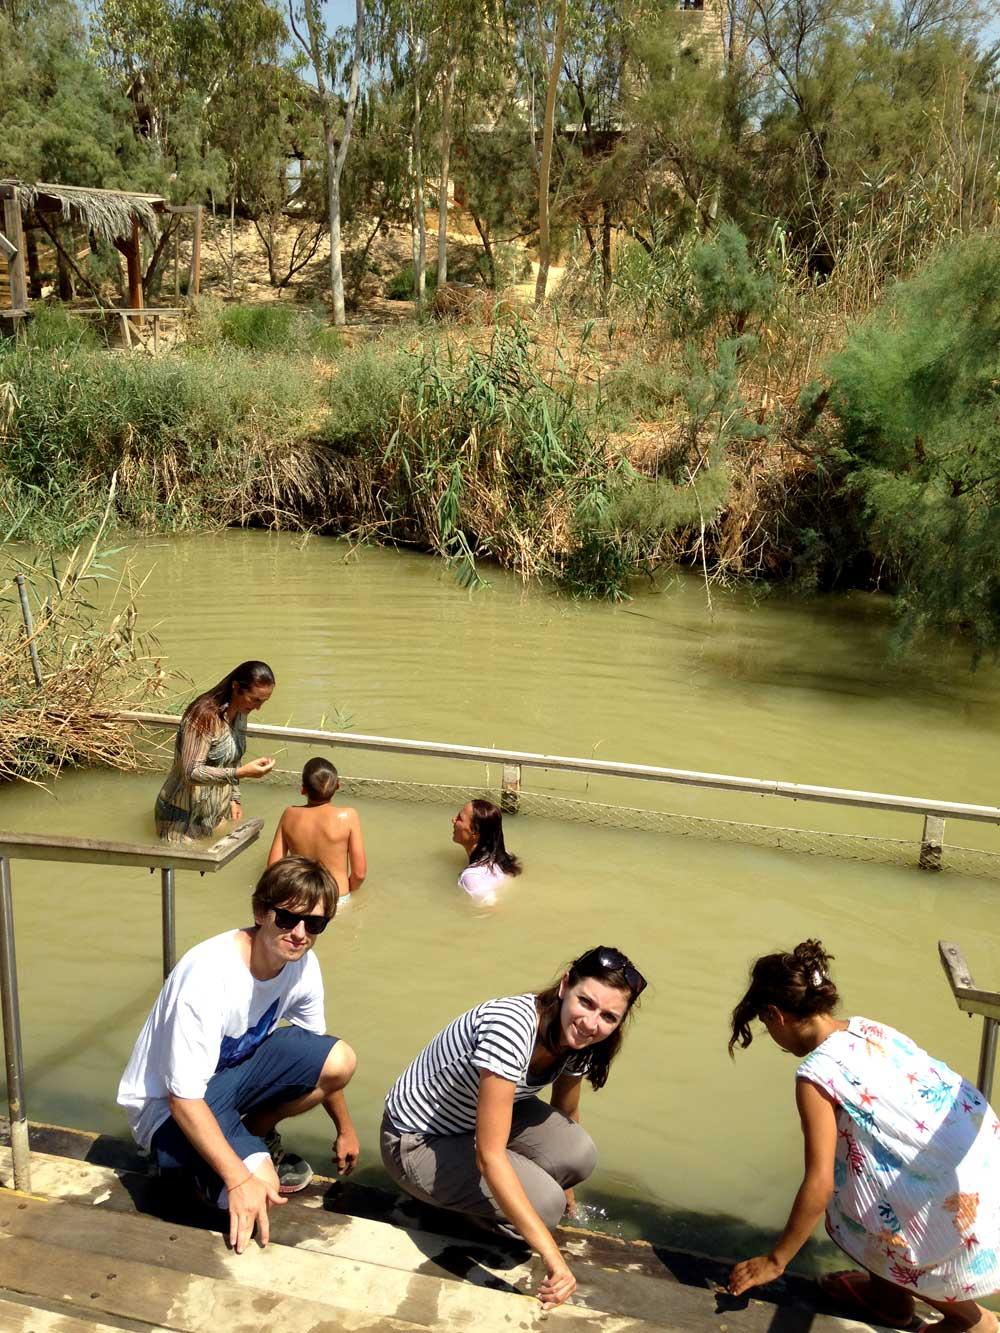 Baptistry on the Jordan River